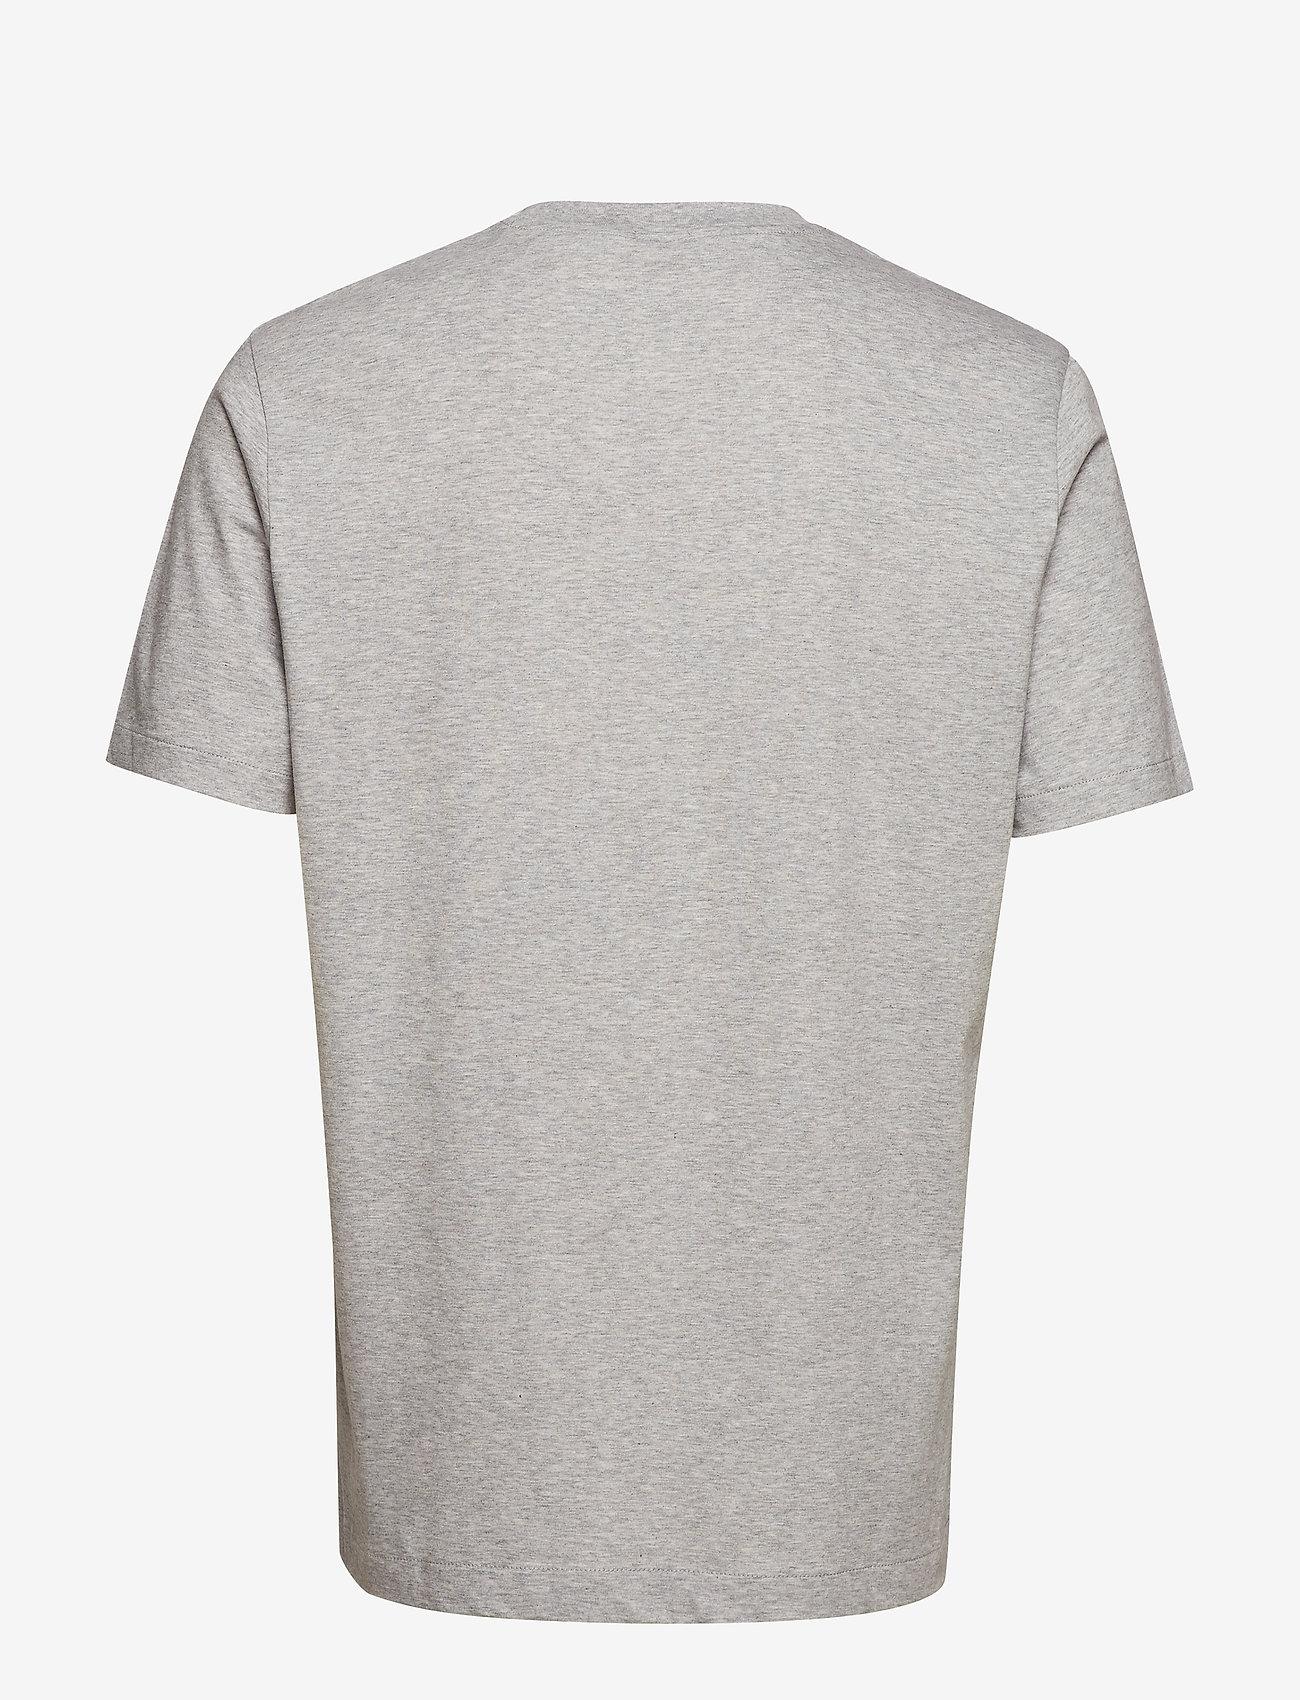 Filippa K - M. Single Jersey Tee - basic t-shirts - light grey - 1